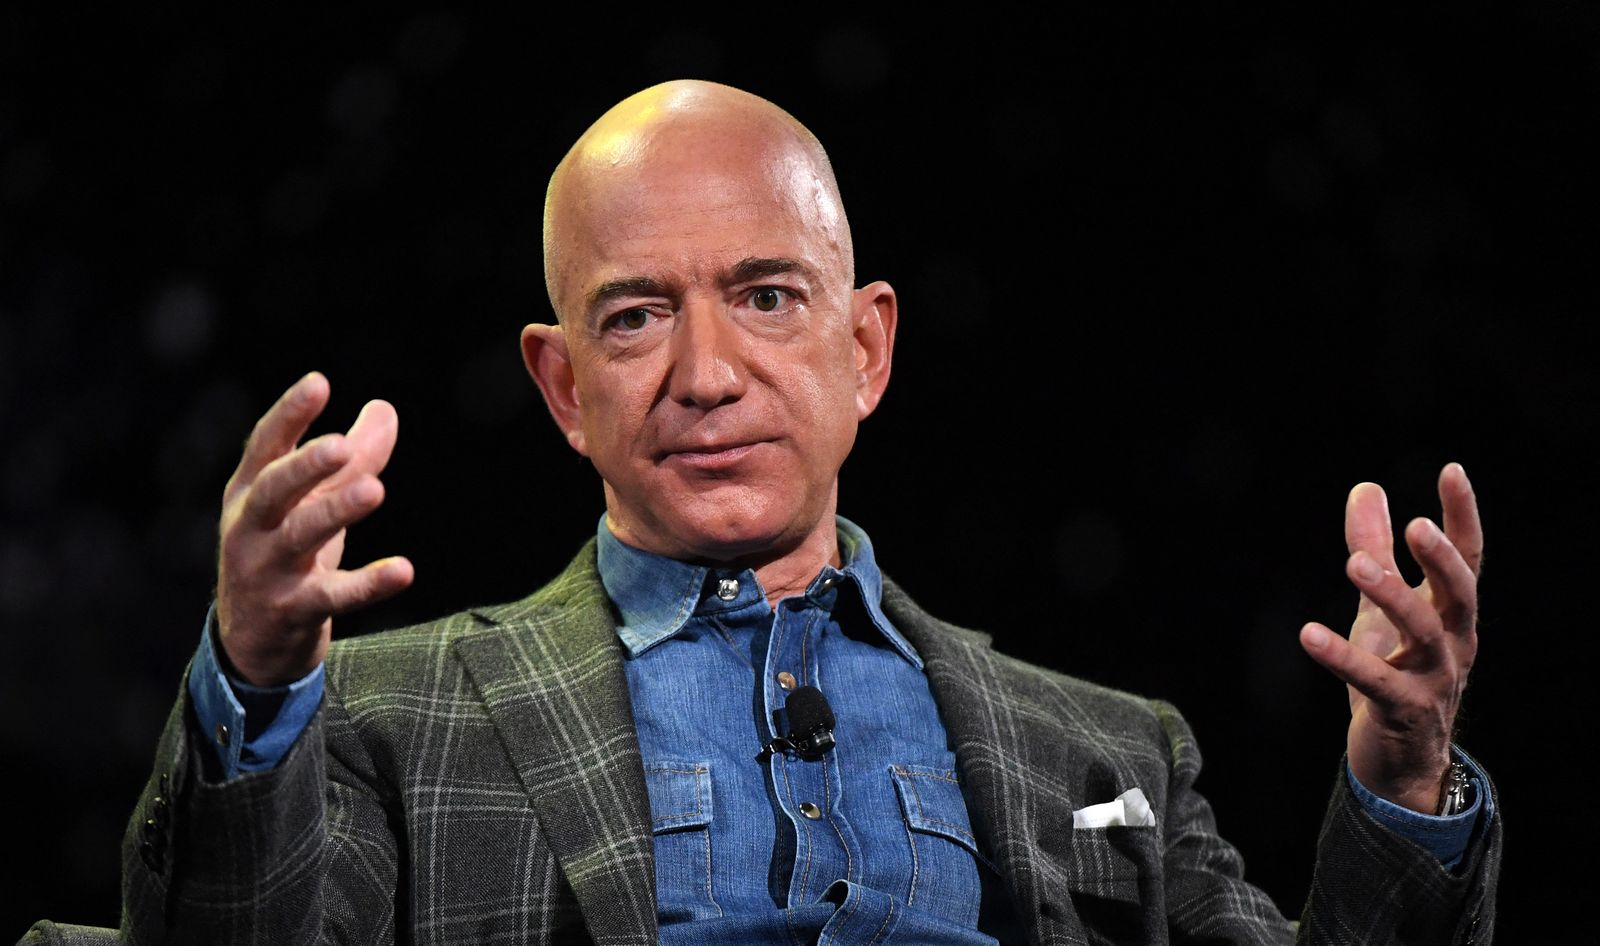 Amazon conference on robotics, artificial intelligence